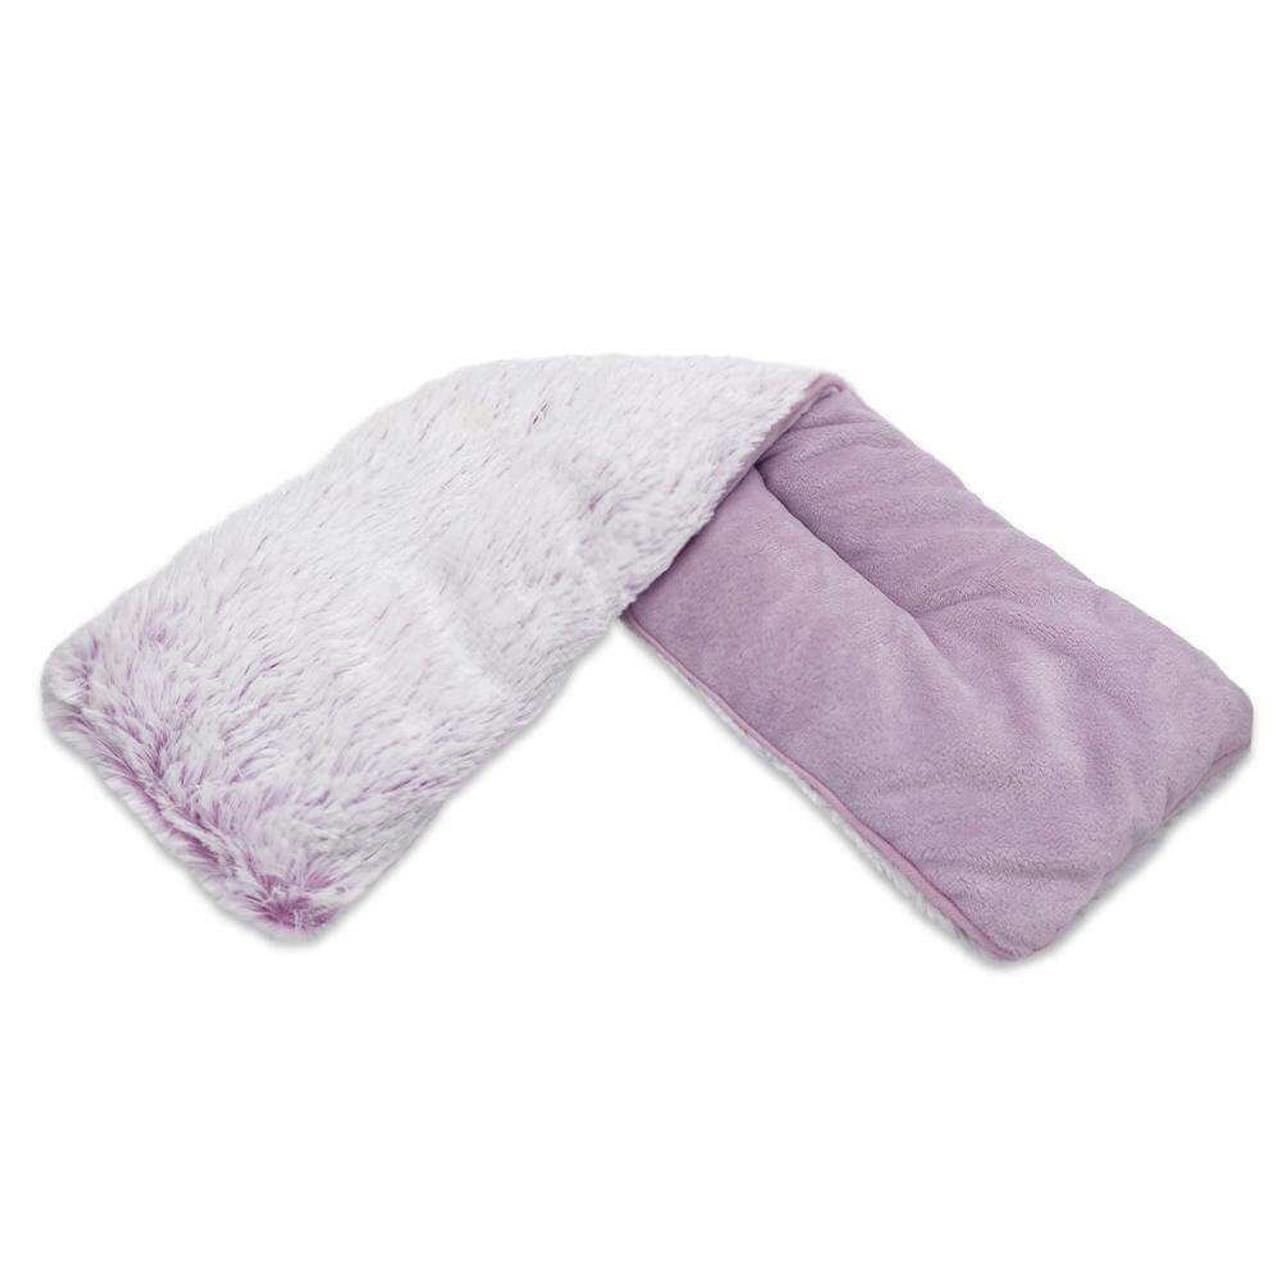 Warmie Neck Wrap in Marshmallow Pink